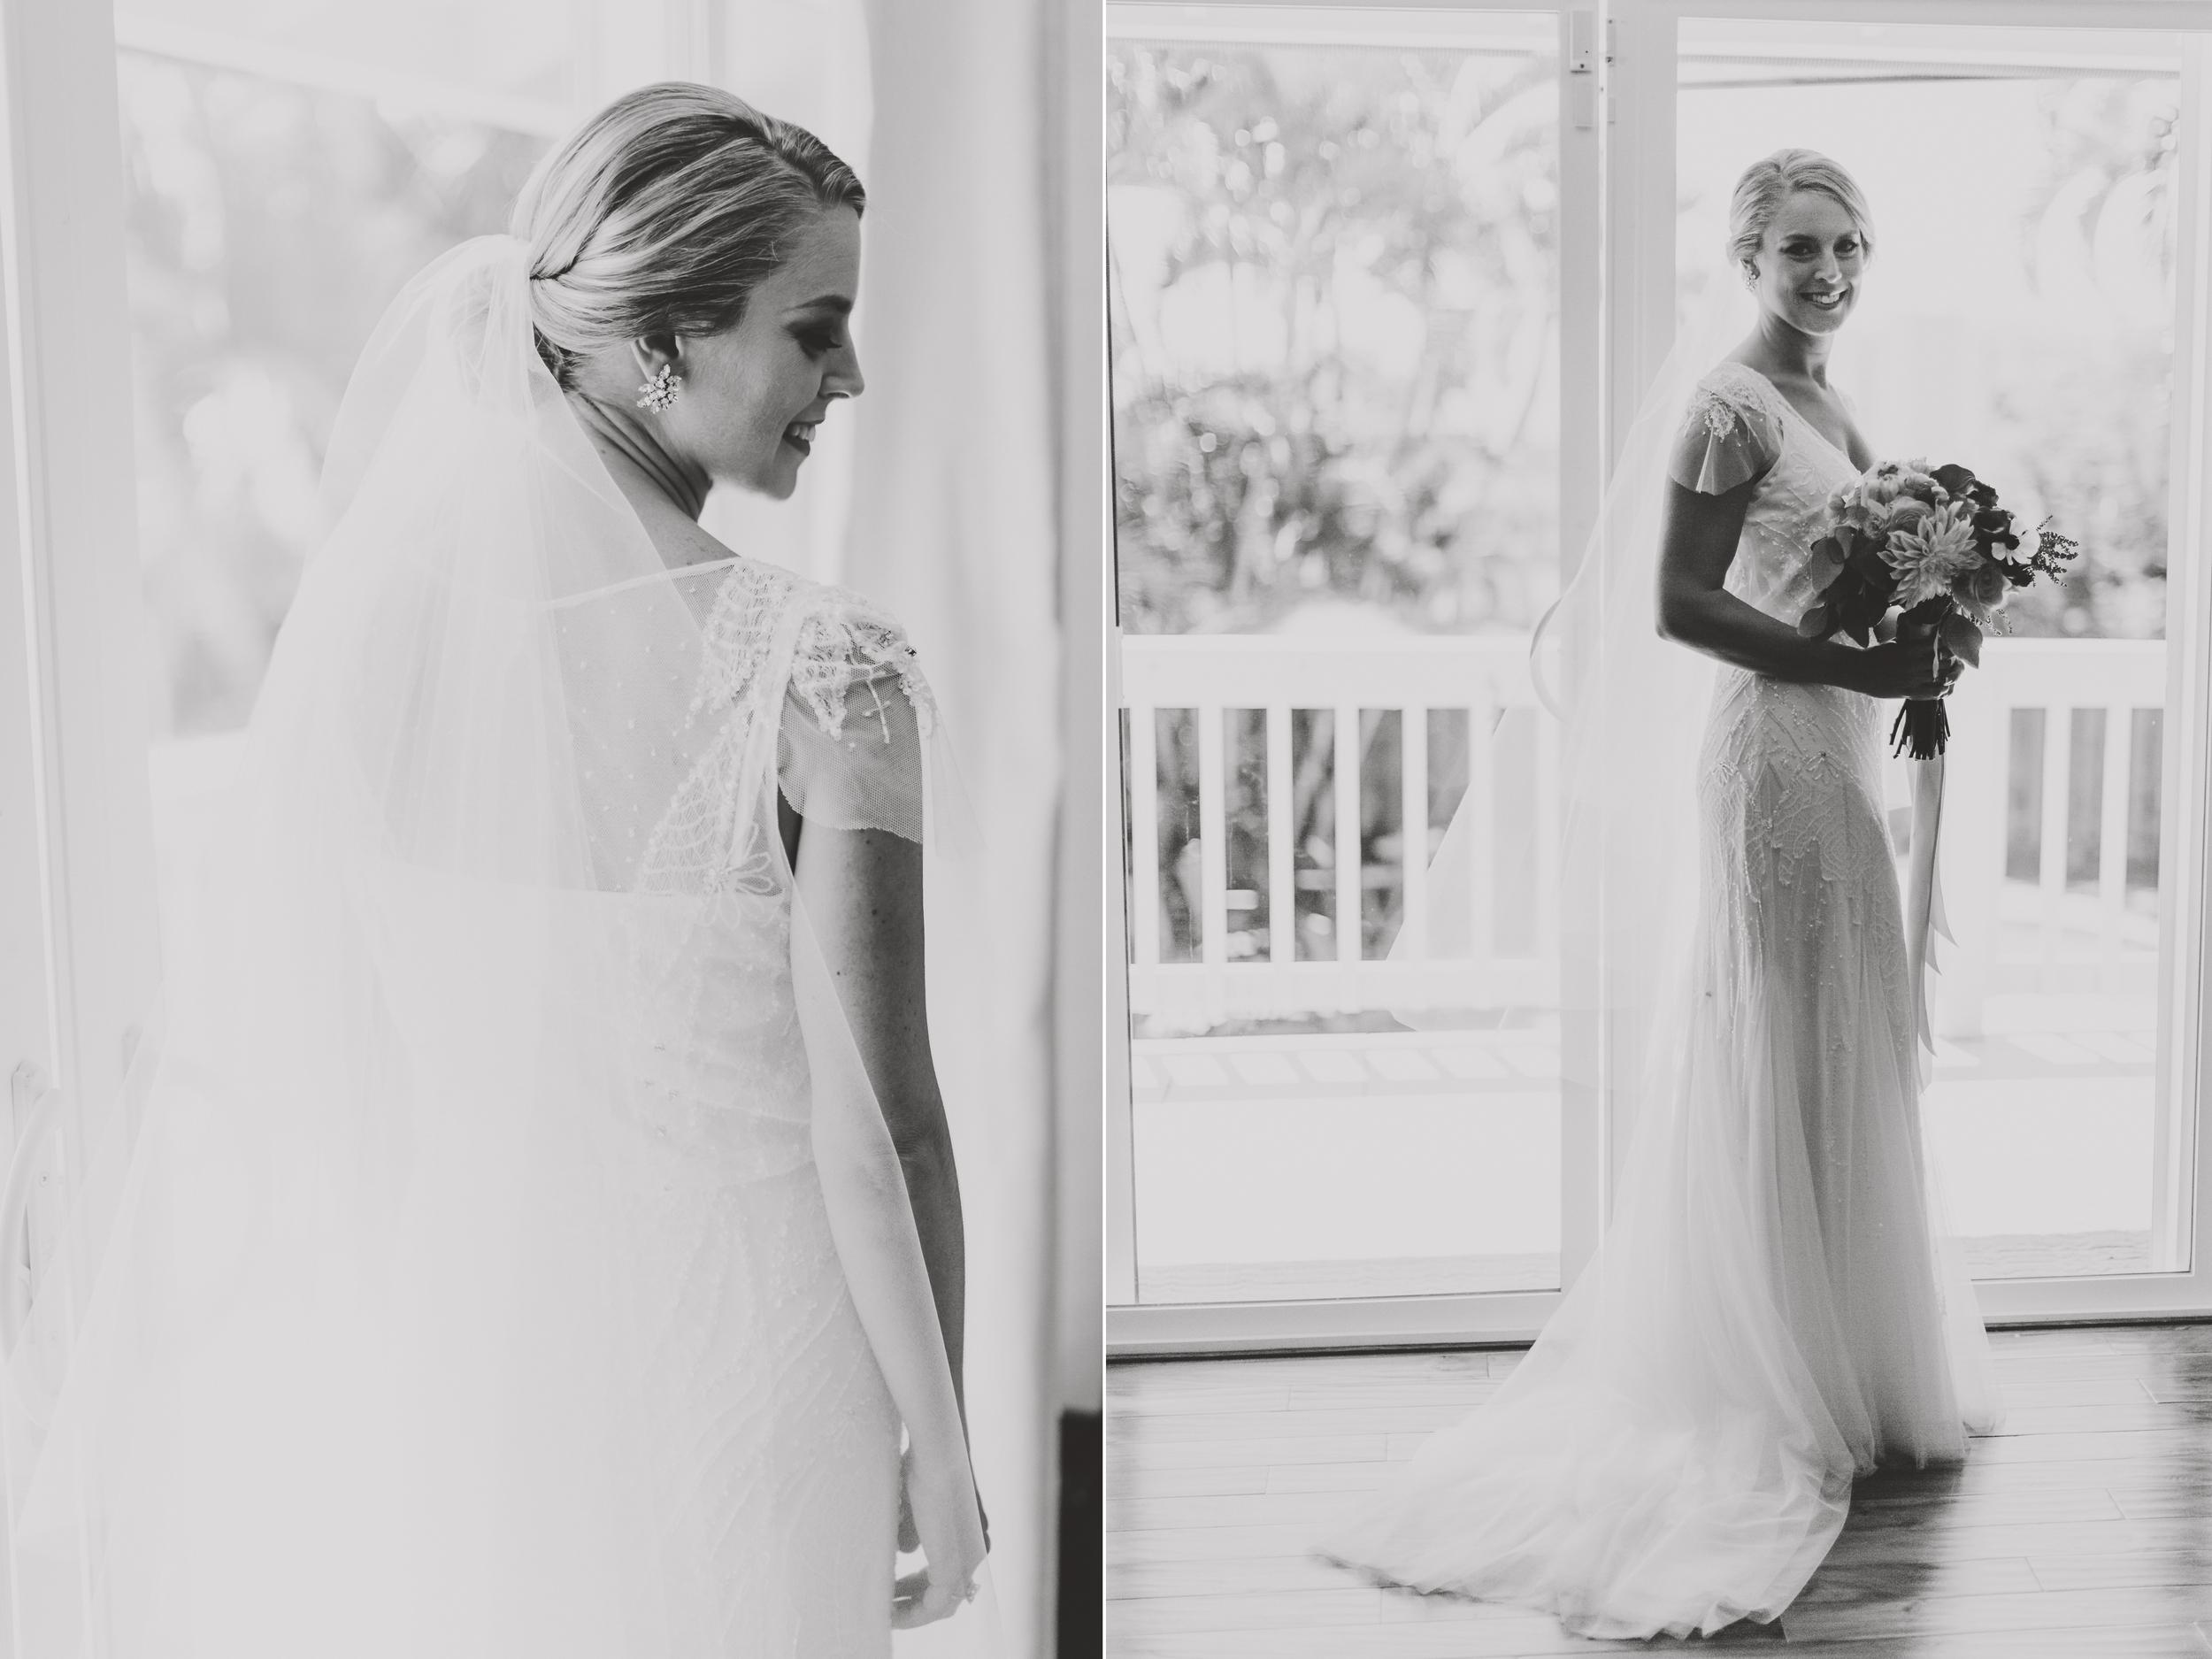 angie-diaz-photography-maui-wedding-mel-matt-09.jpg